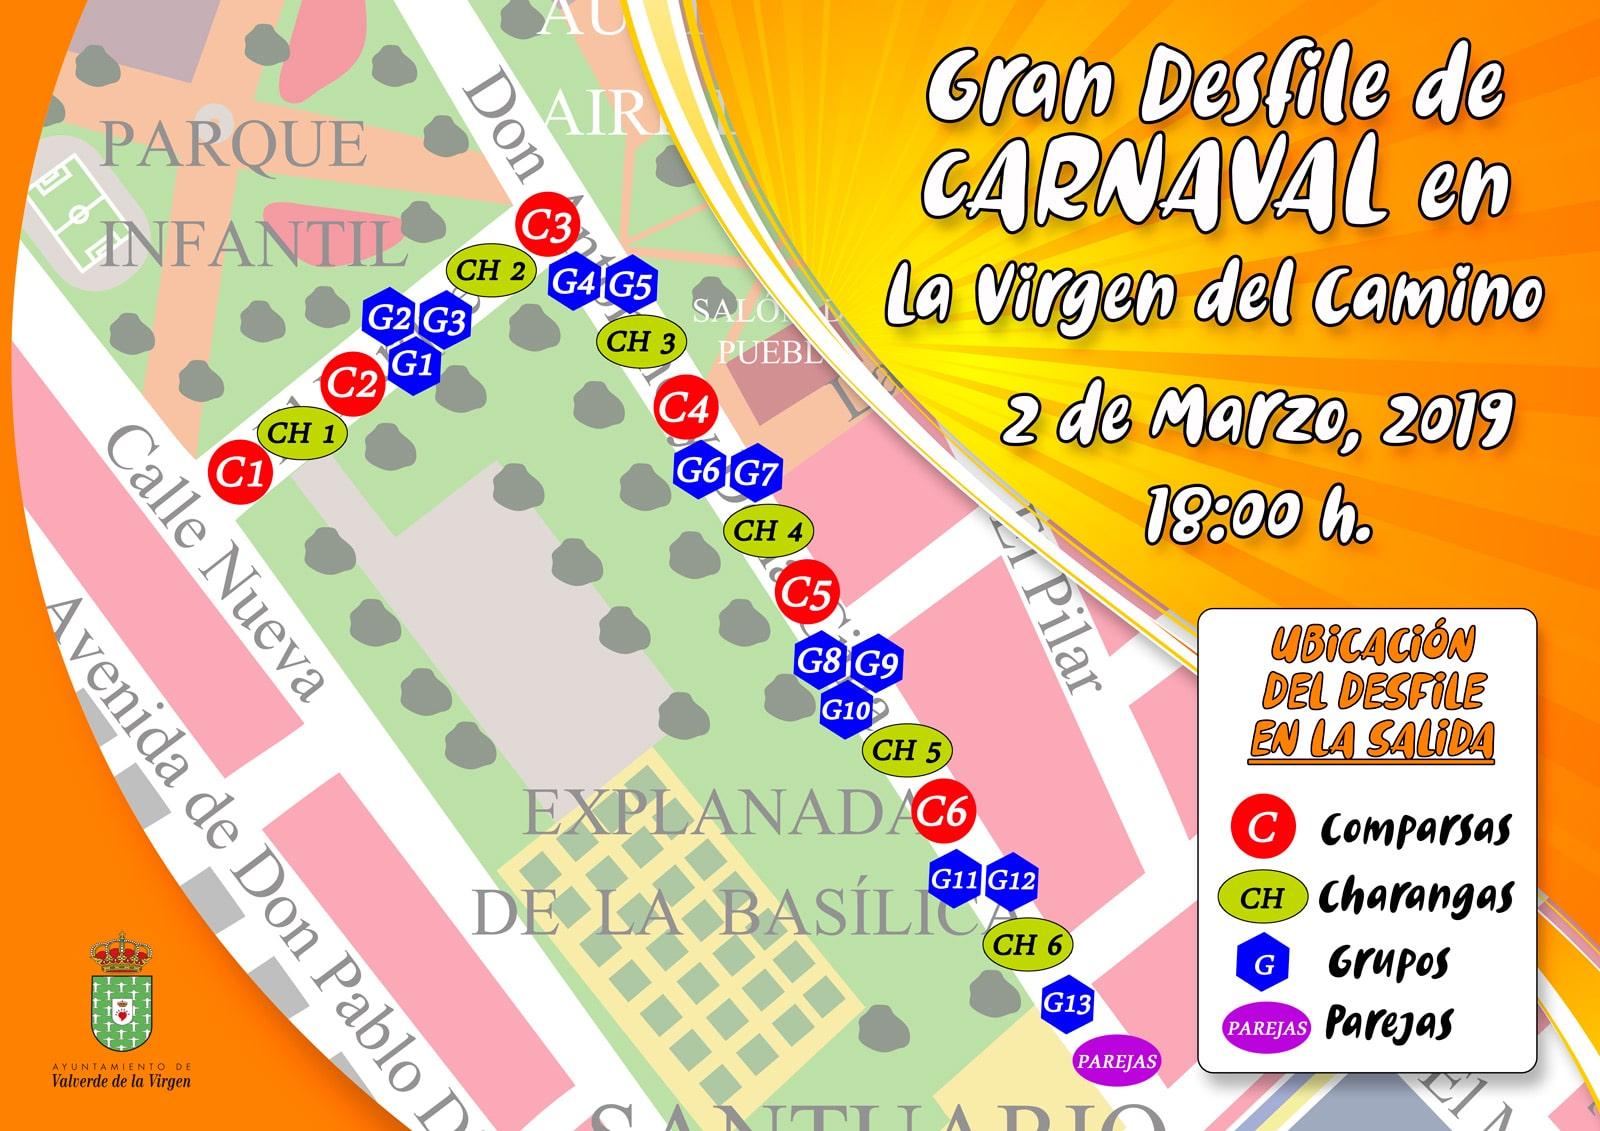 Gran Desfile Carnaval 2019